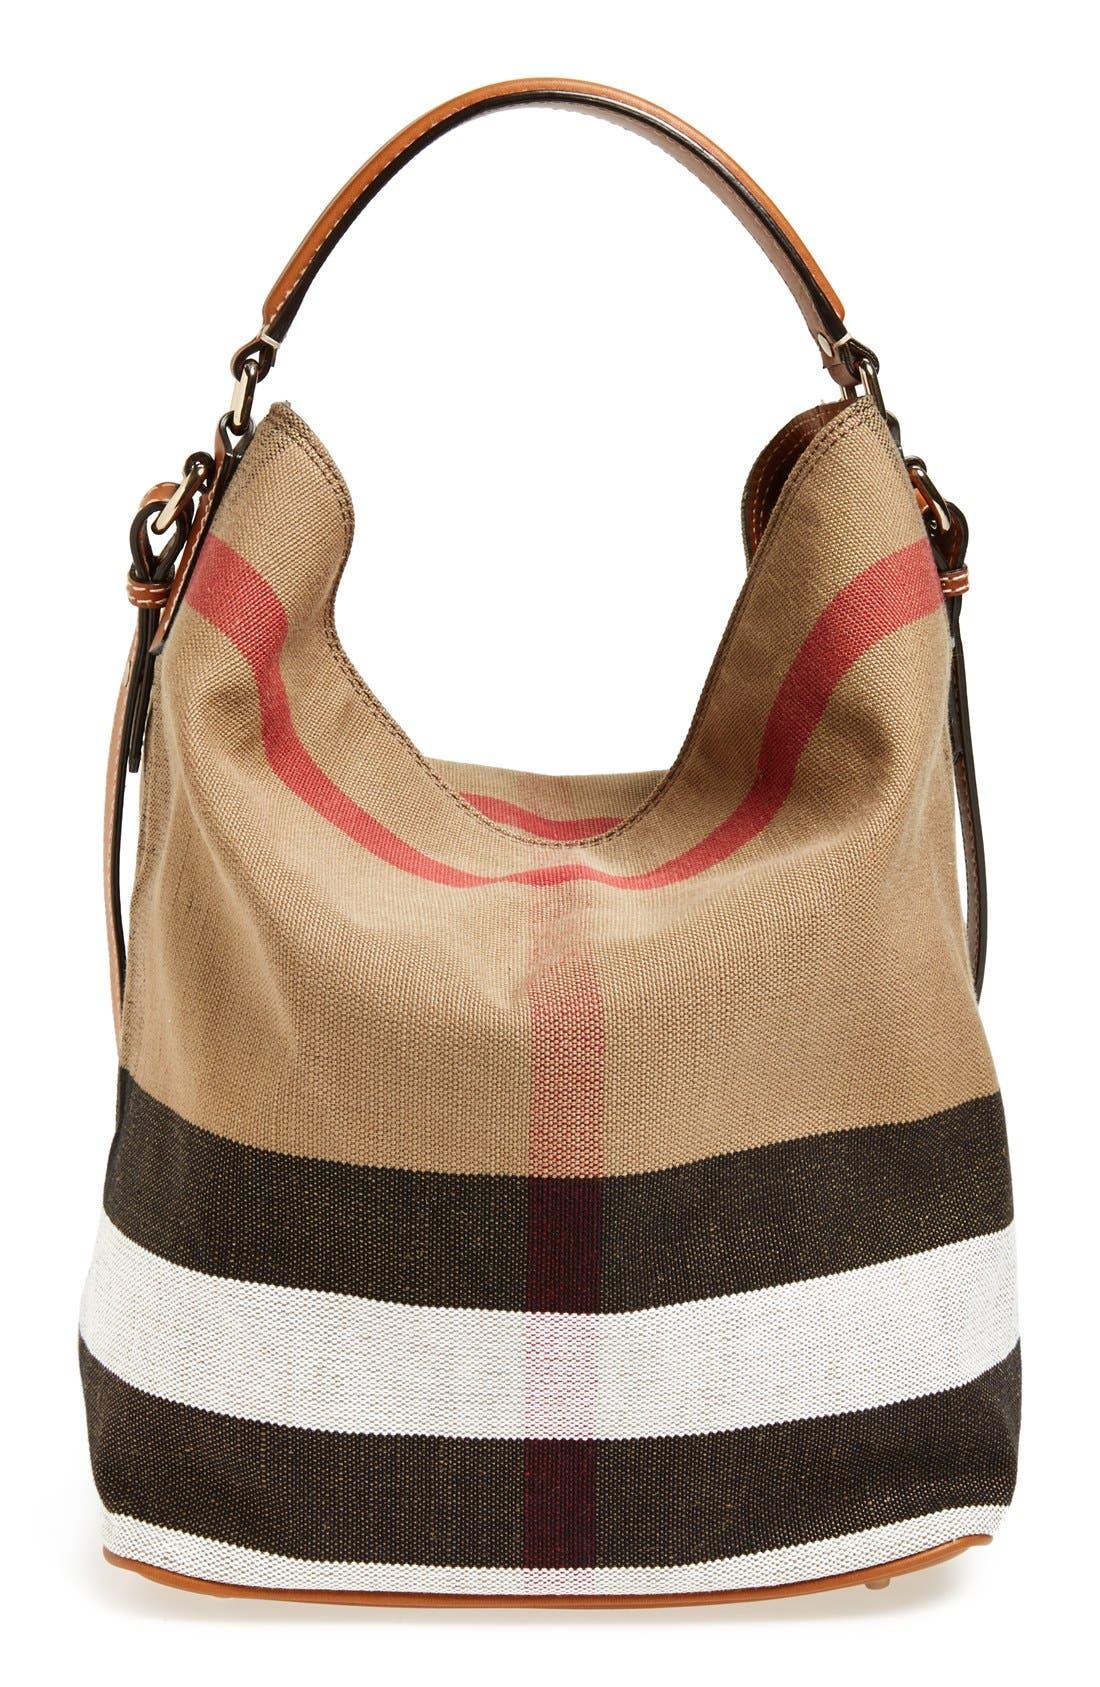 Alternate Image 1 Selected - Burberry Medium Ashby Check Print Bucket Bag